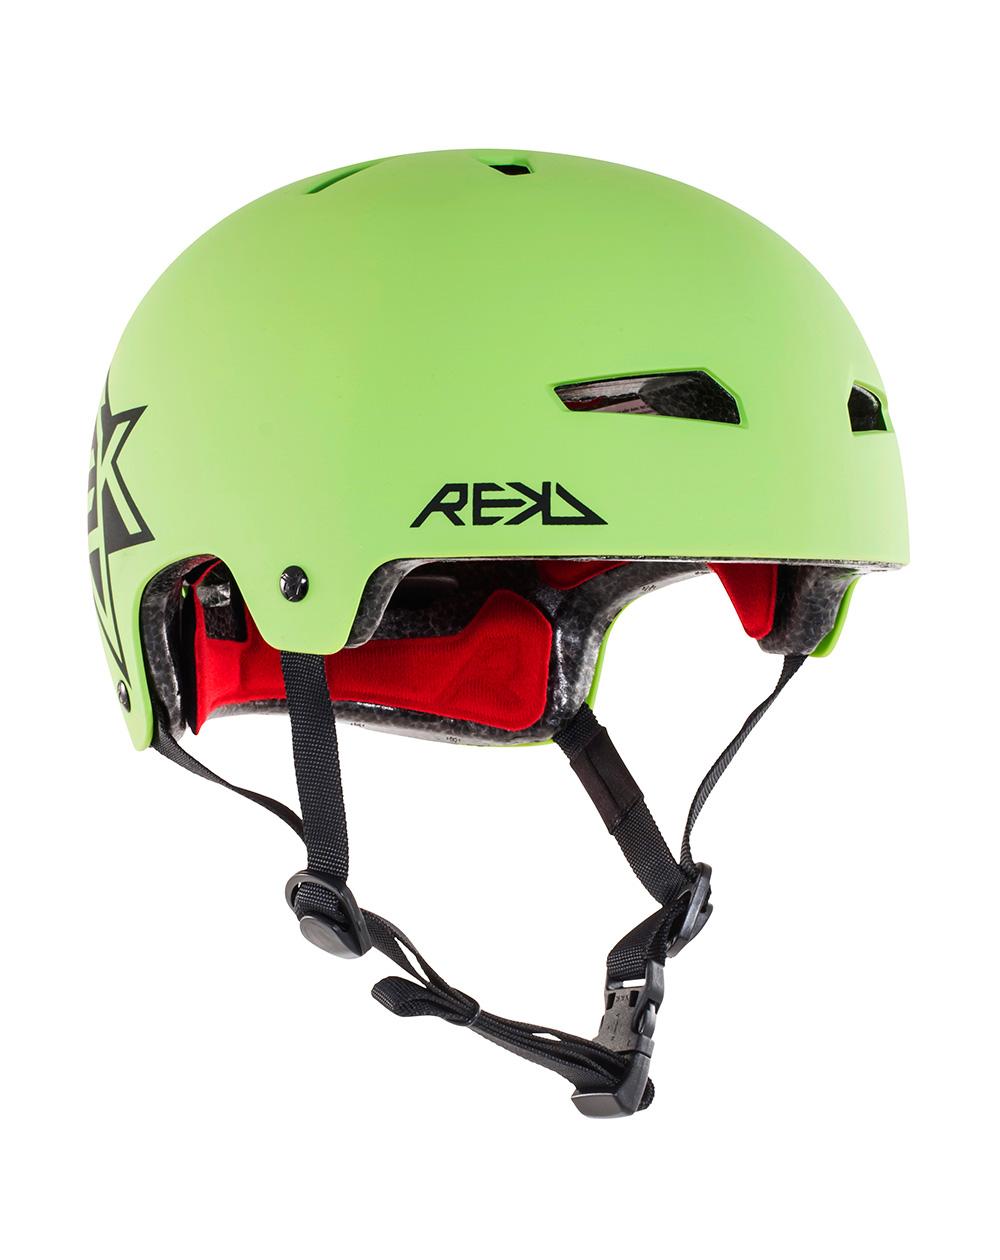 Rekd Protection Elite Icon Skateboard Helmet Green/Black